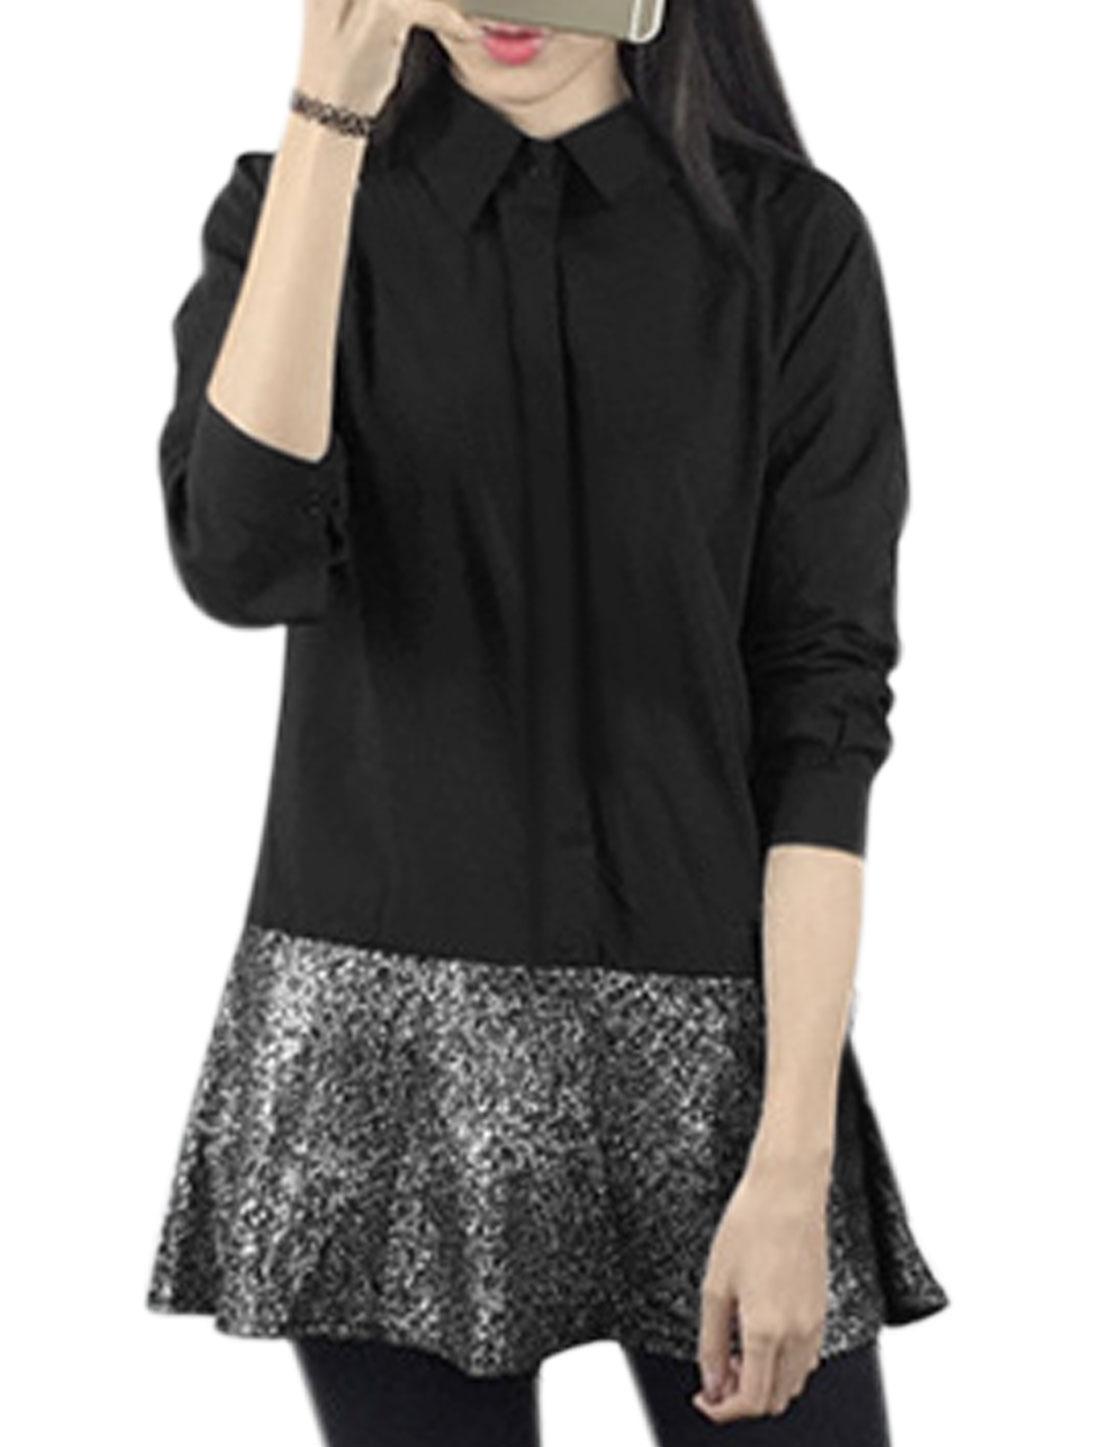 Women Hidden Placket Upper Shiny Panel Layered Tunic Shirt Dress Black XS